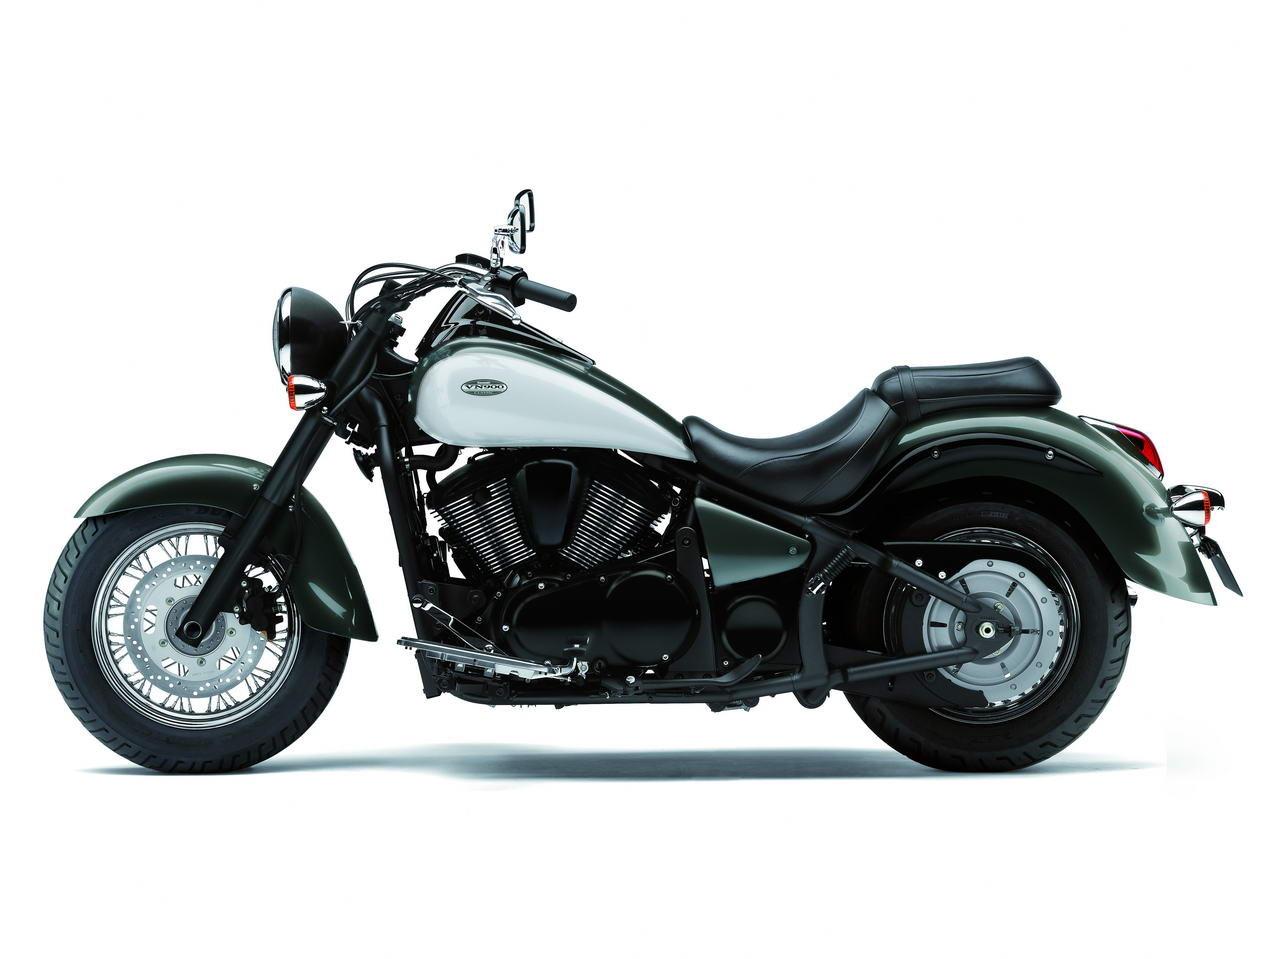 Listino Kawasaki VN 900 Classic Special Custom e Cruiser - image 15538_kawasaki-vn900-classic on http://moto.motori.net